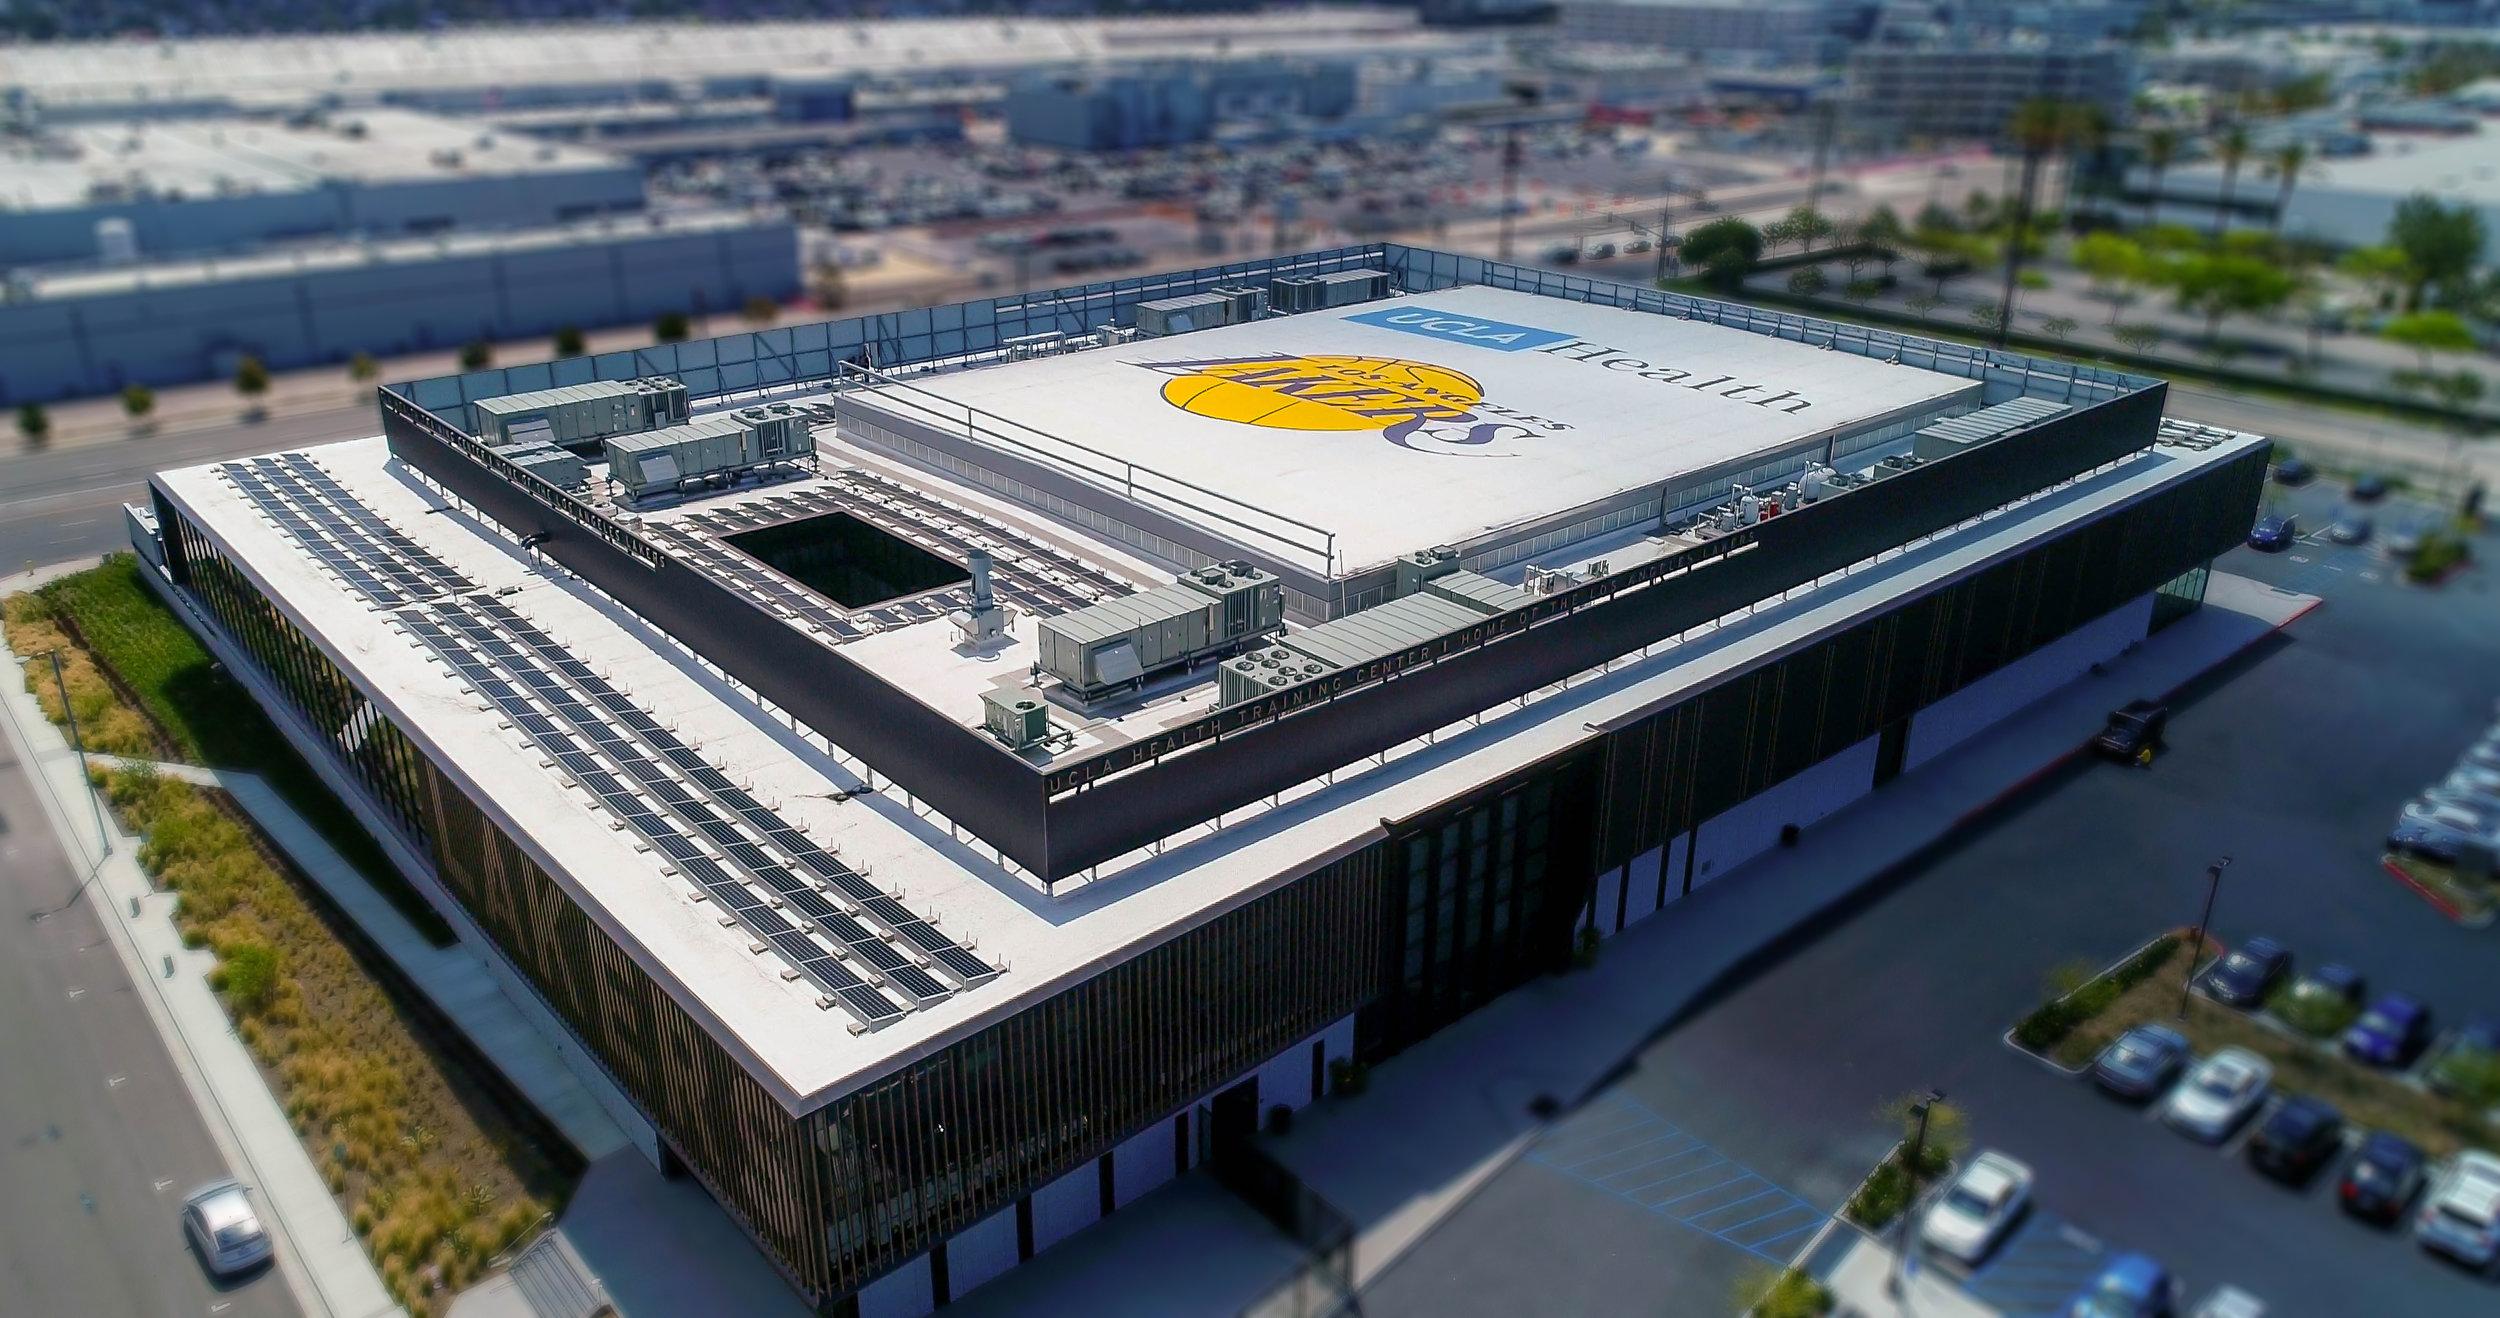 LG_LA_Lakers_2018_1.jpg